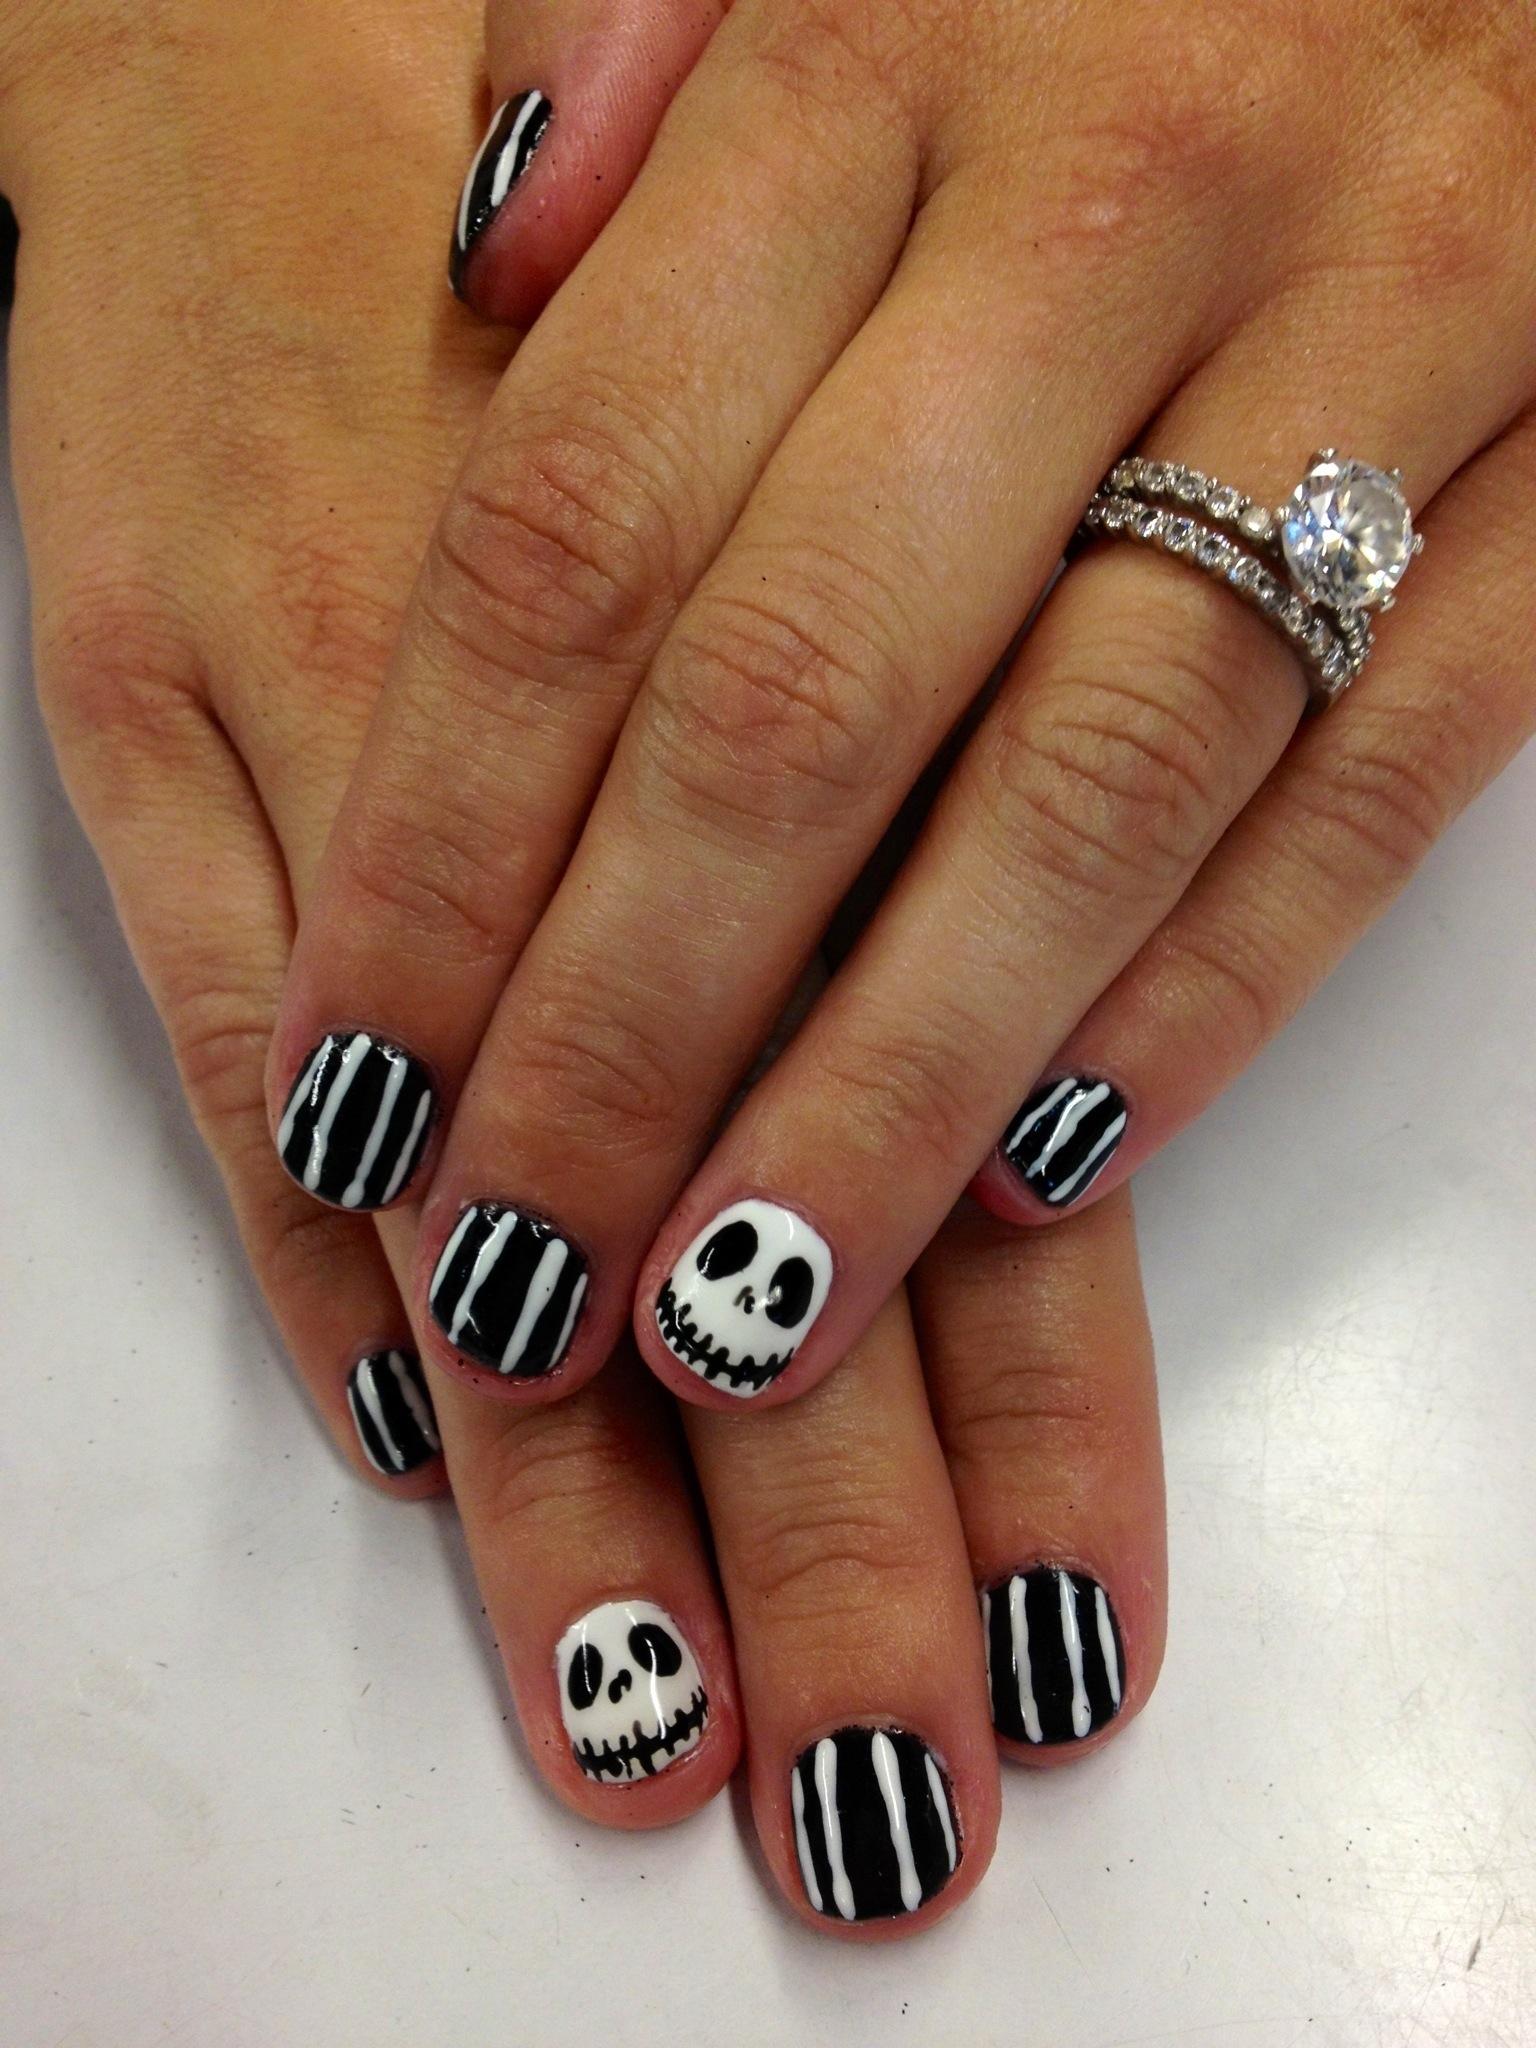 Jack skelington nail art | Home Sweet Nails